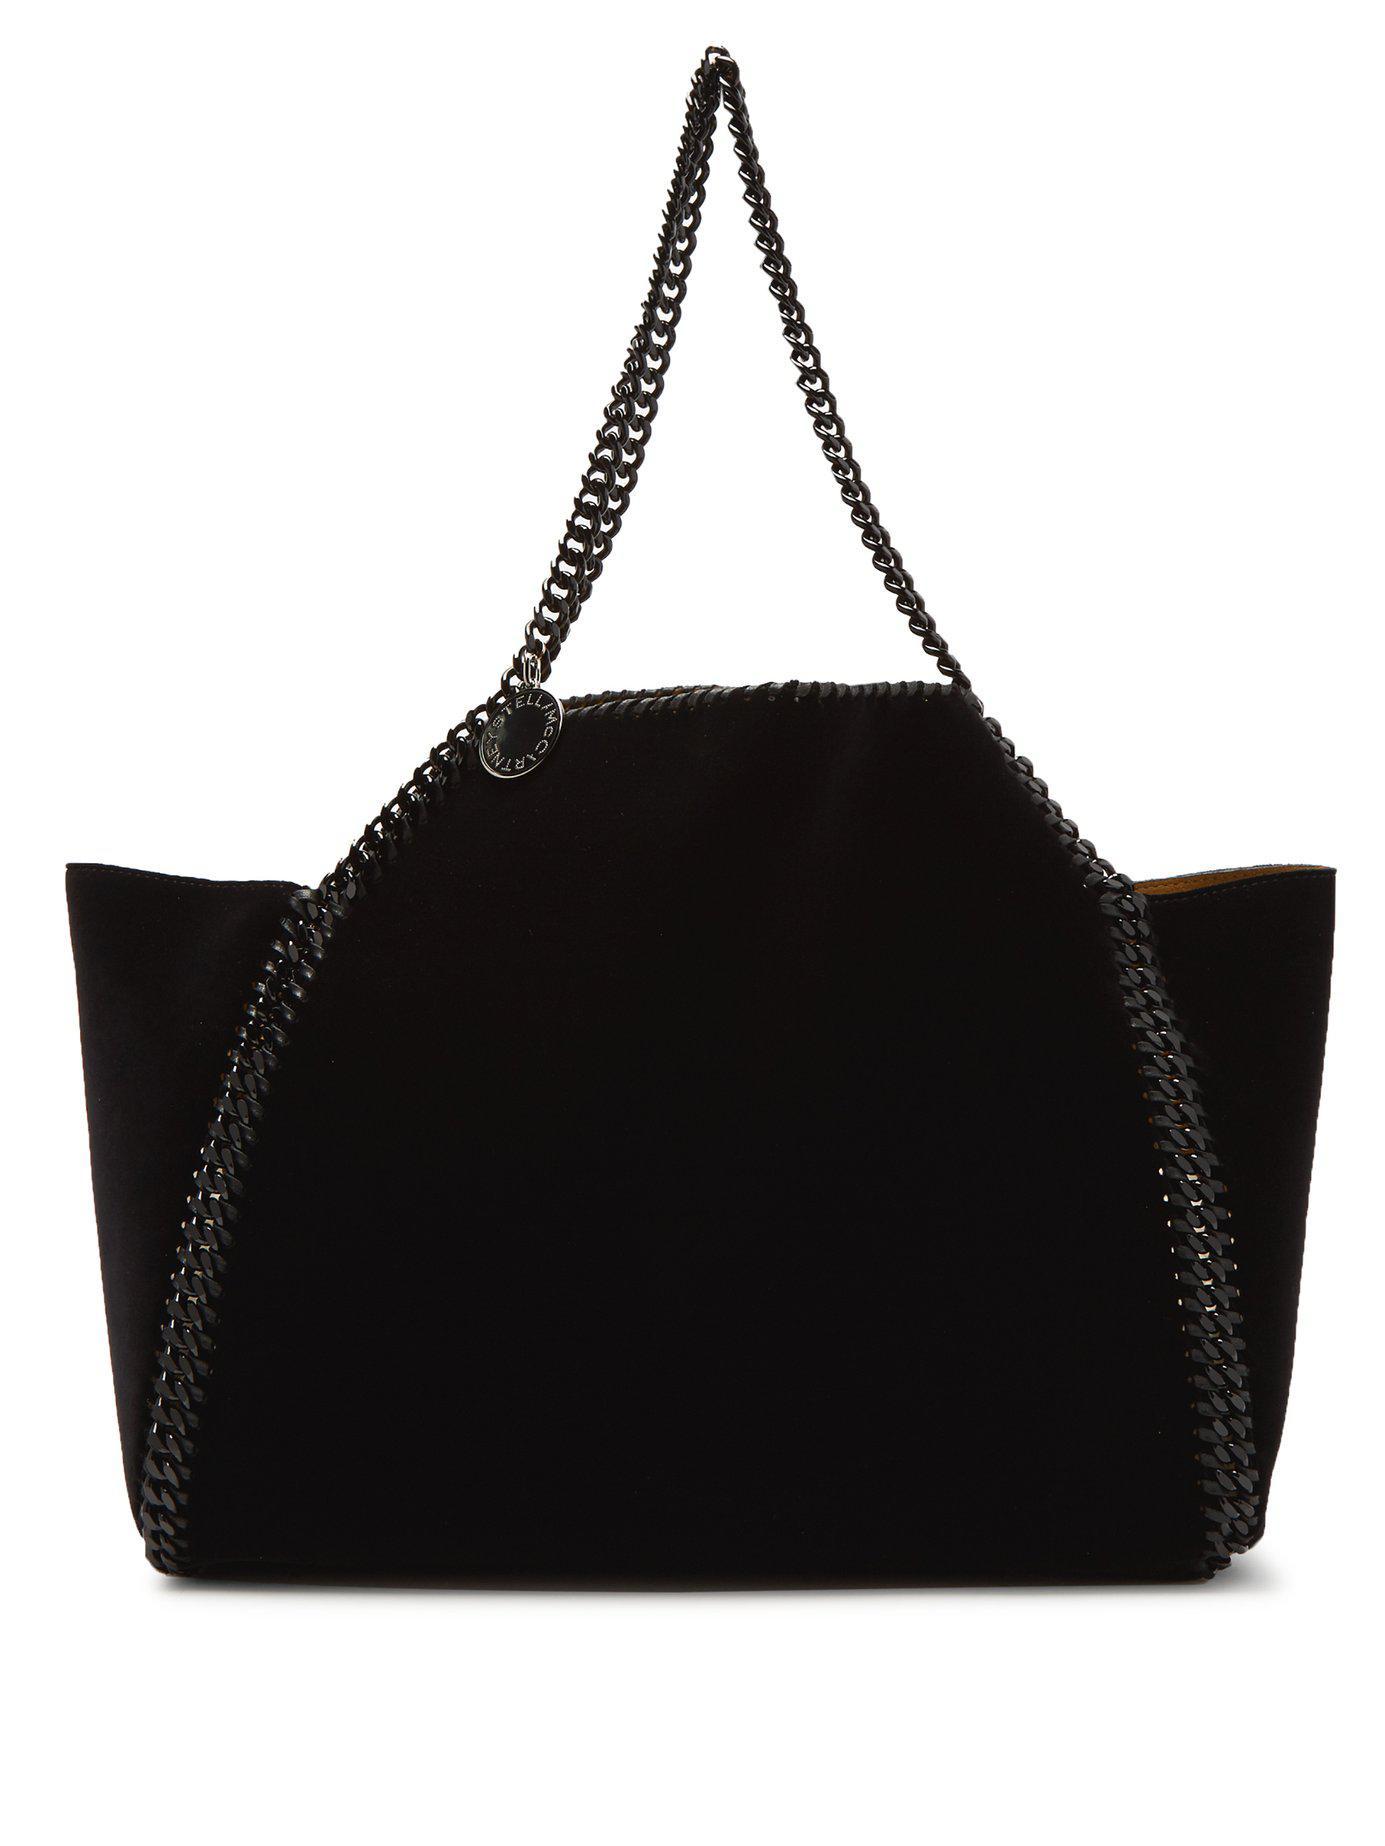 5dacf01b65 Stella McCartney. Women s Black Falabella Small Reversible Velvet Tote Bag